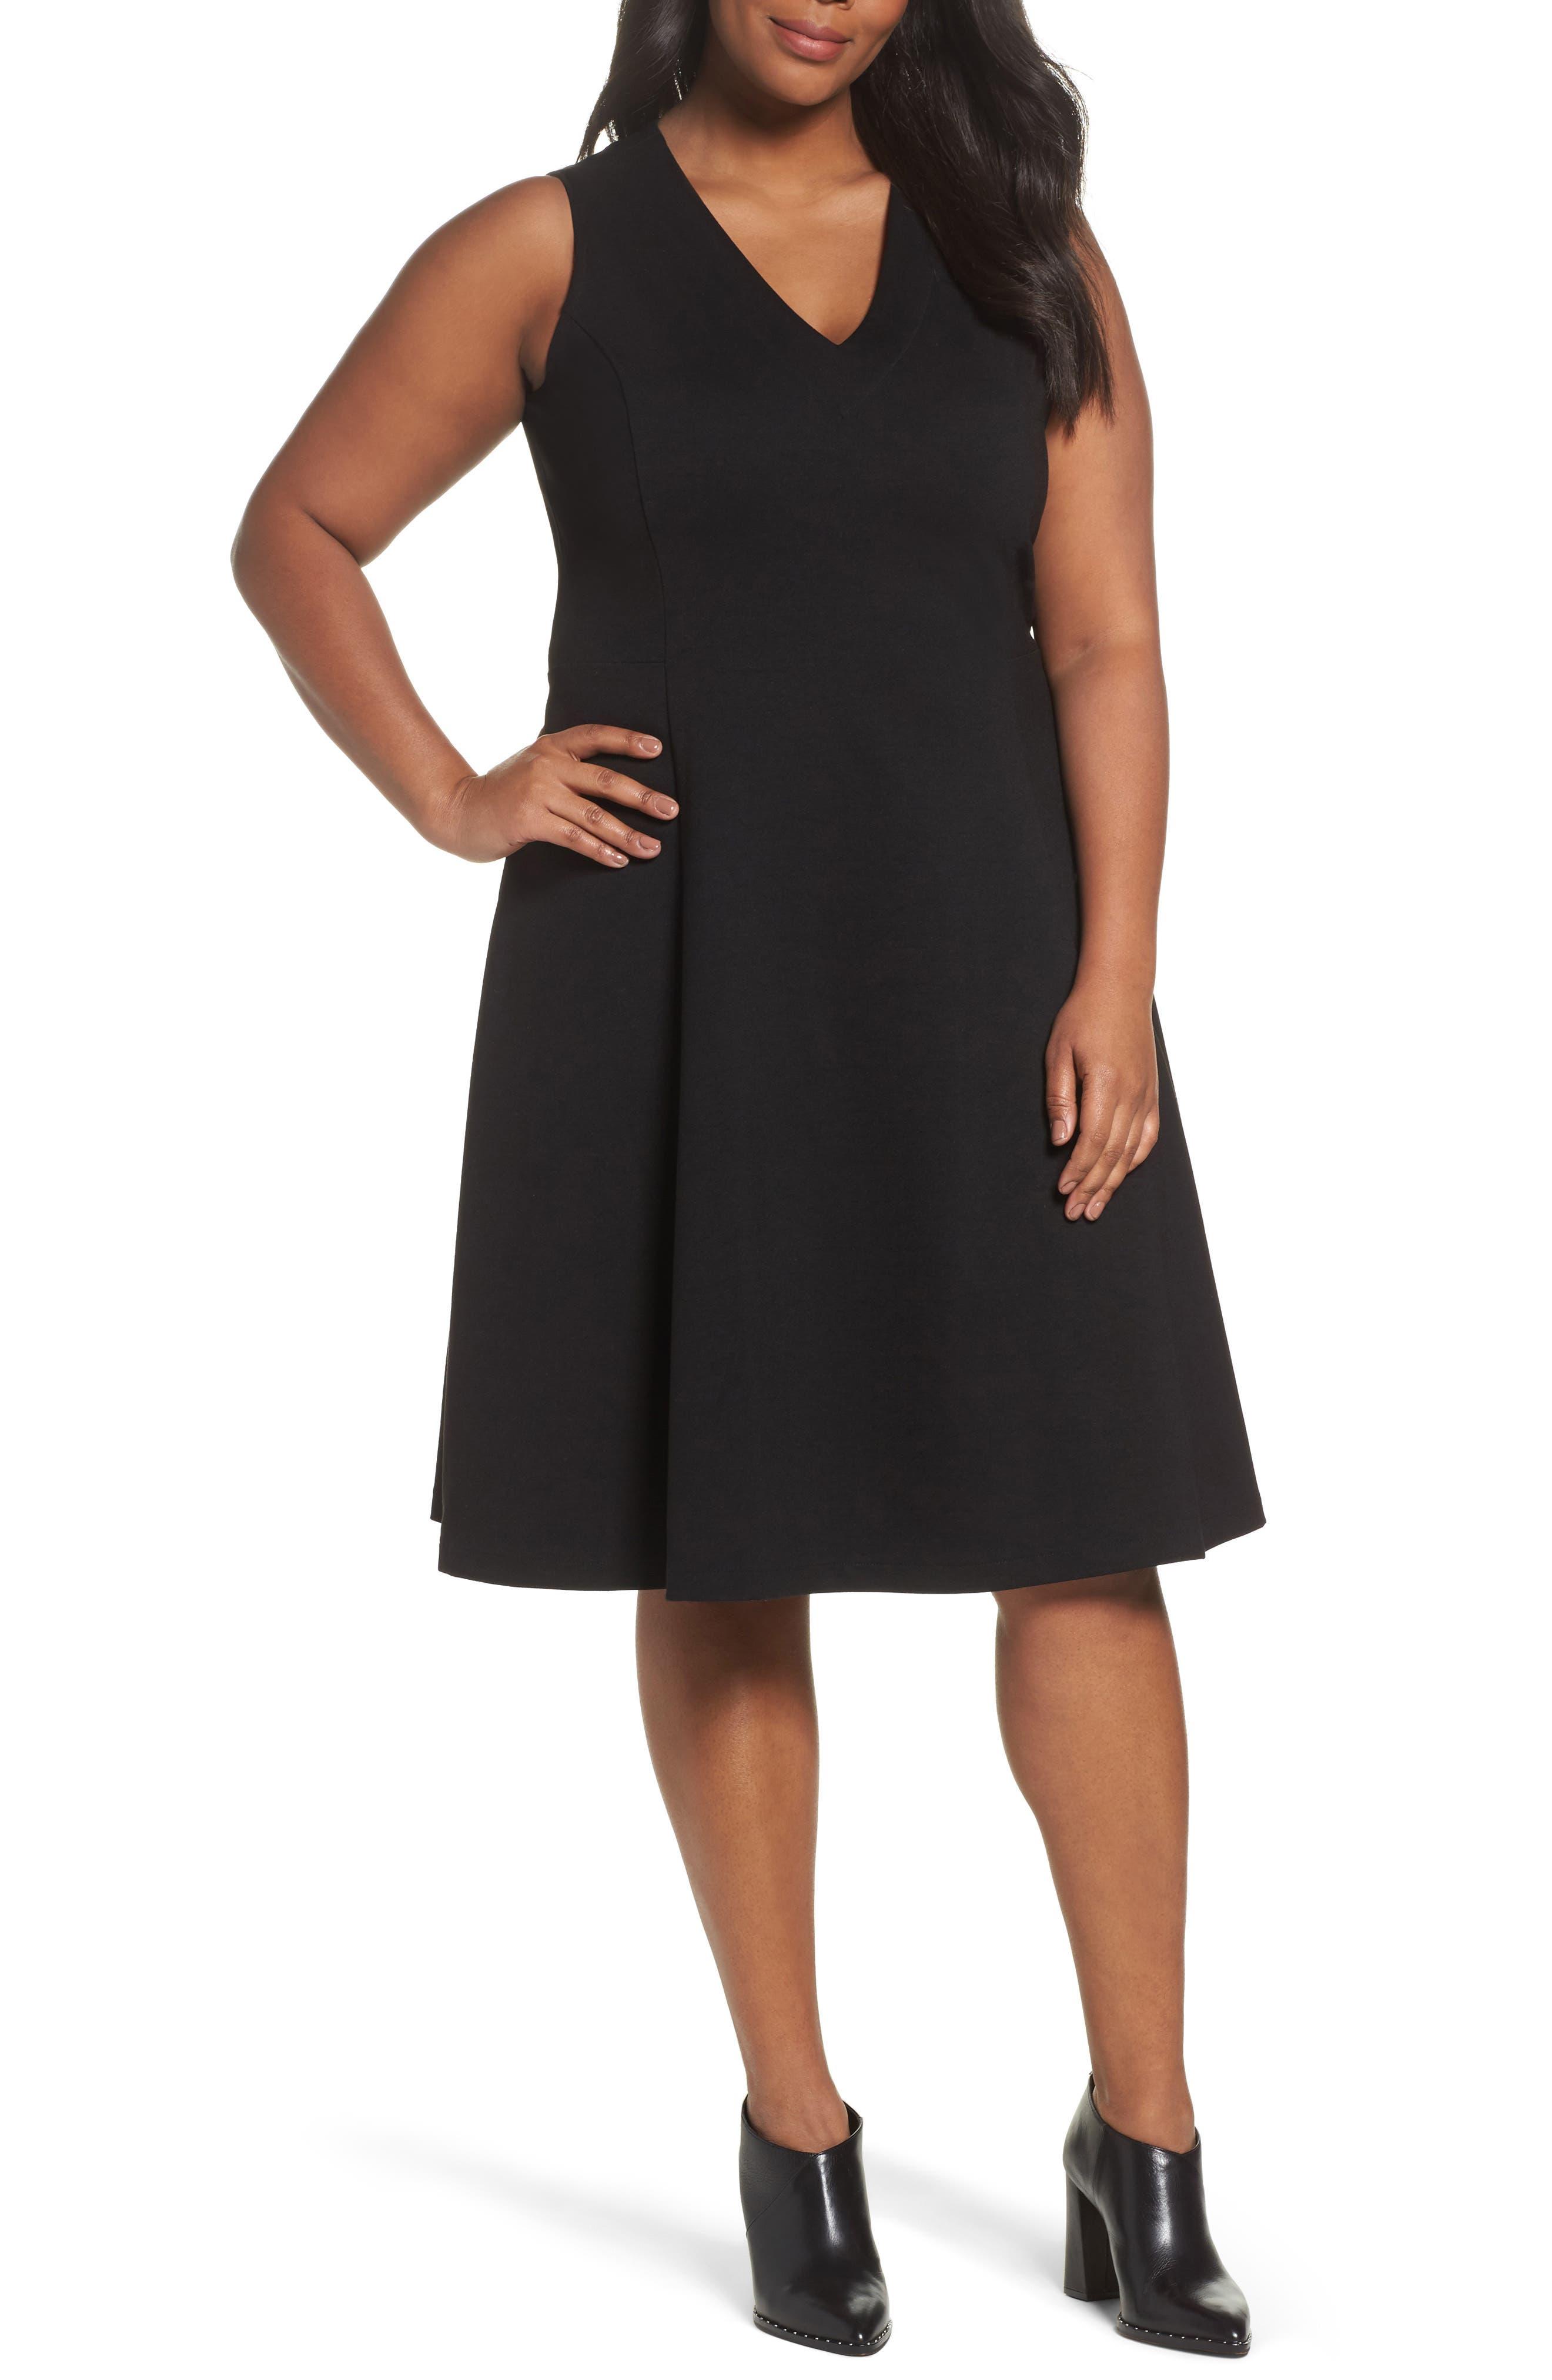 Plus Size Dressy Black Dresses